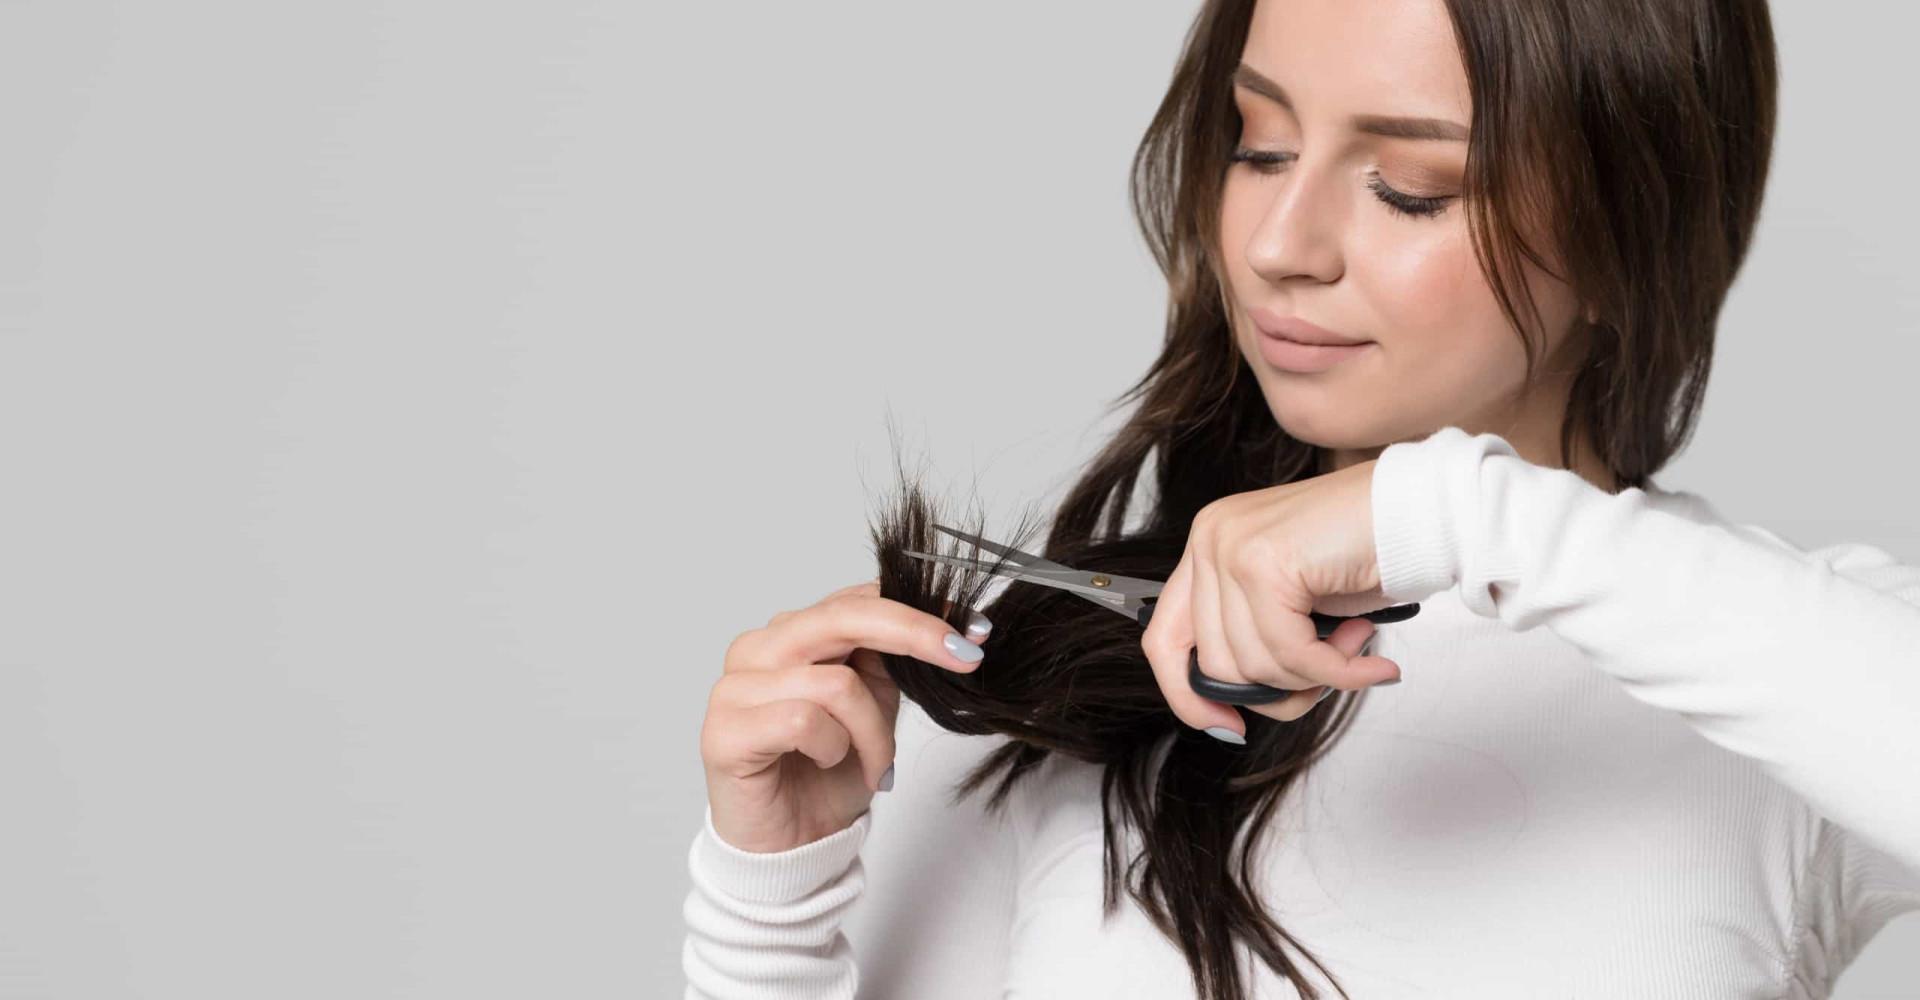 Bra tips innan du klipper ditt hår på egen hand